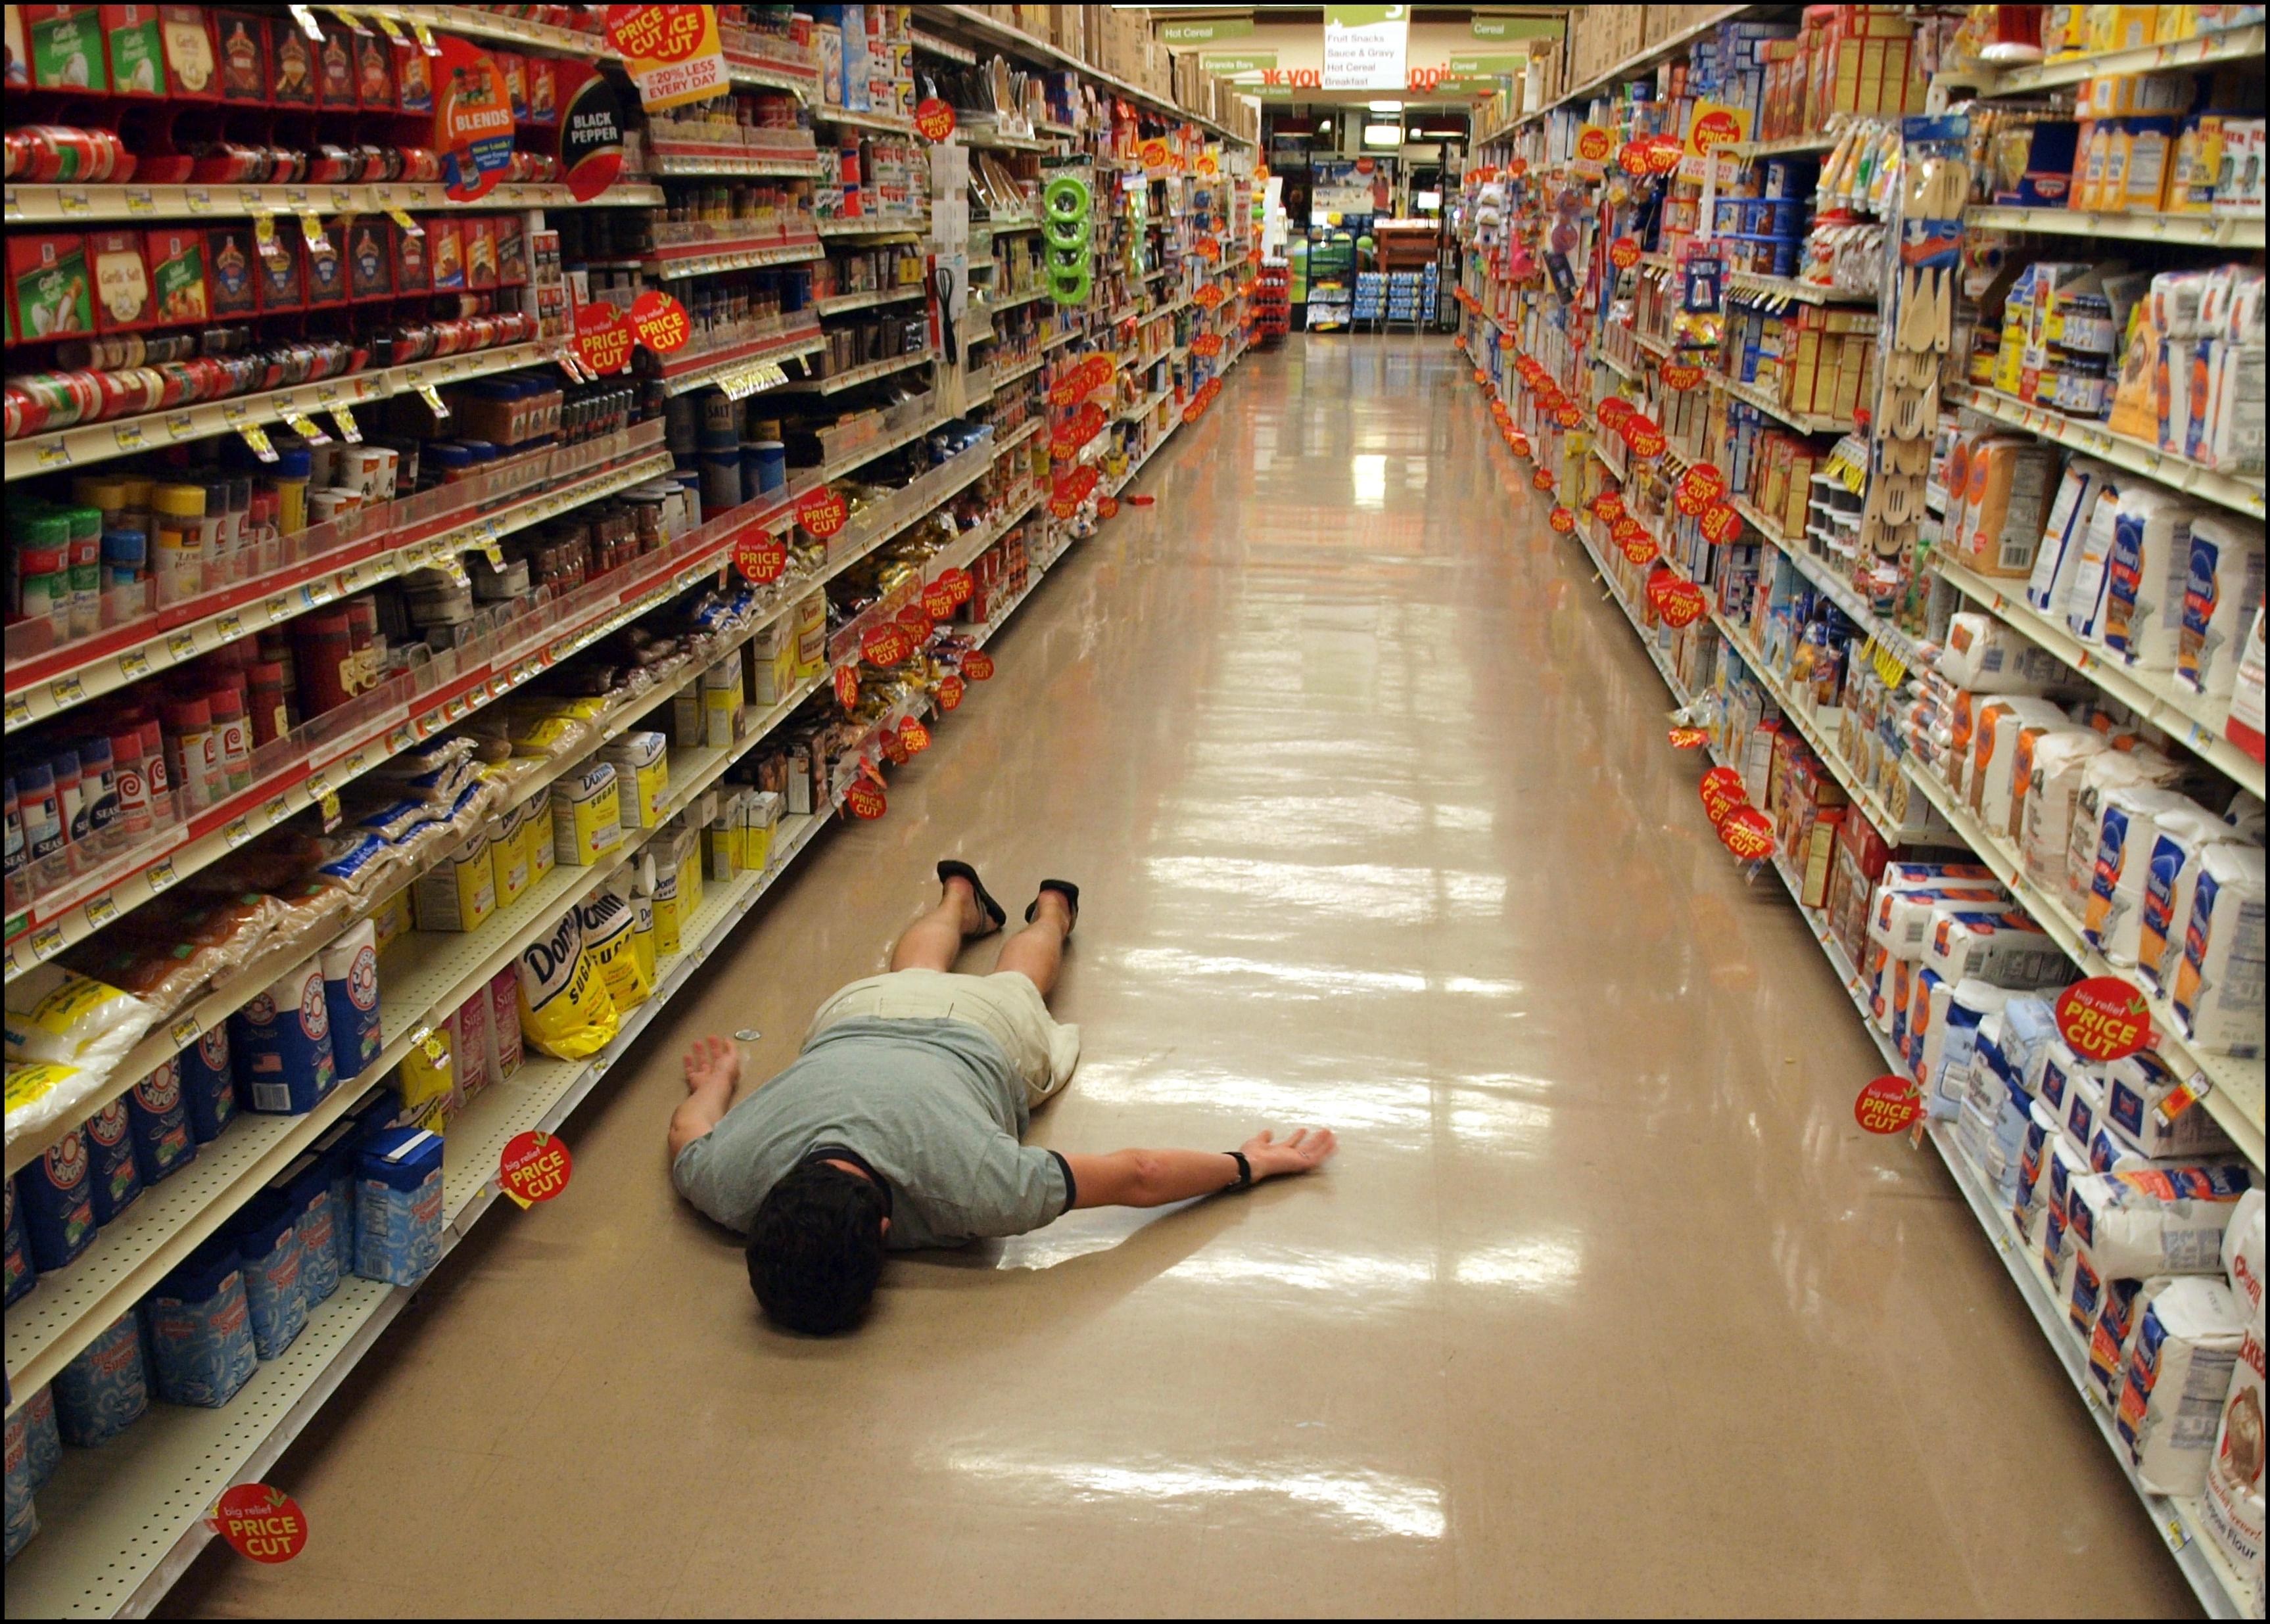 File:Planking in supermarket.jpg - Wikimedia Commons